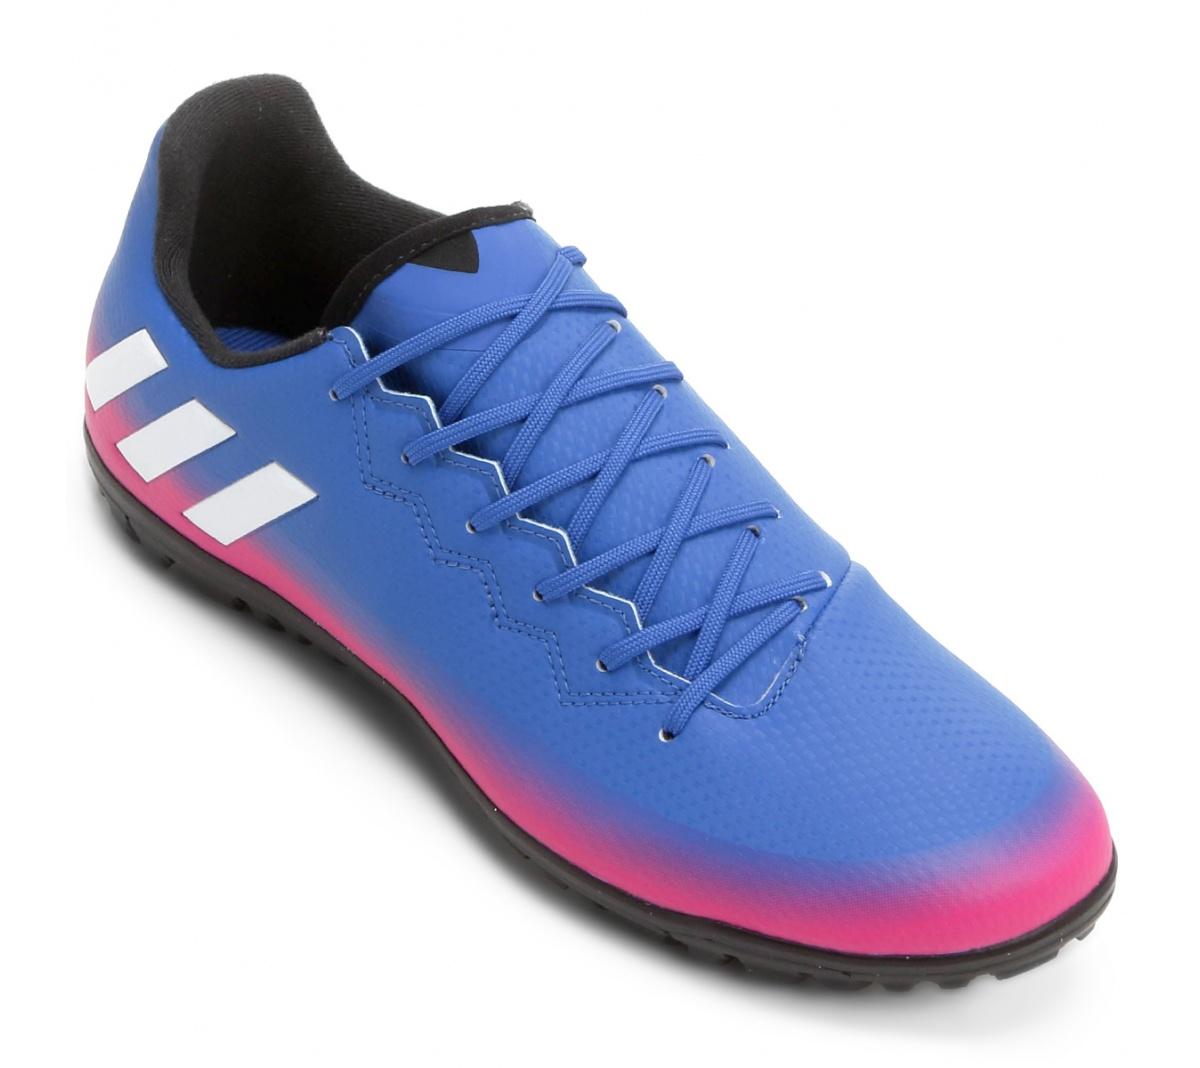 Chuteira Messi 16.3 Adidas Society Chuteira Messi 16.3 Adidas Society ... 2dfe22b5974aa